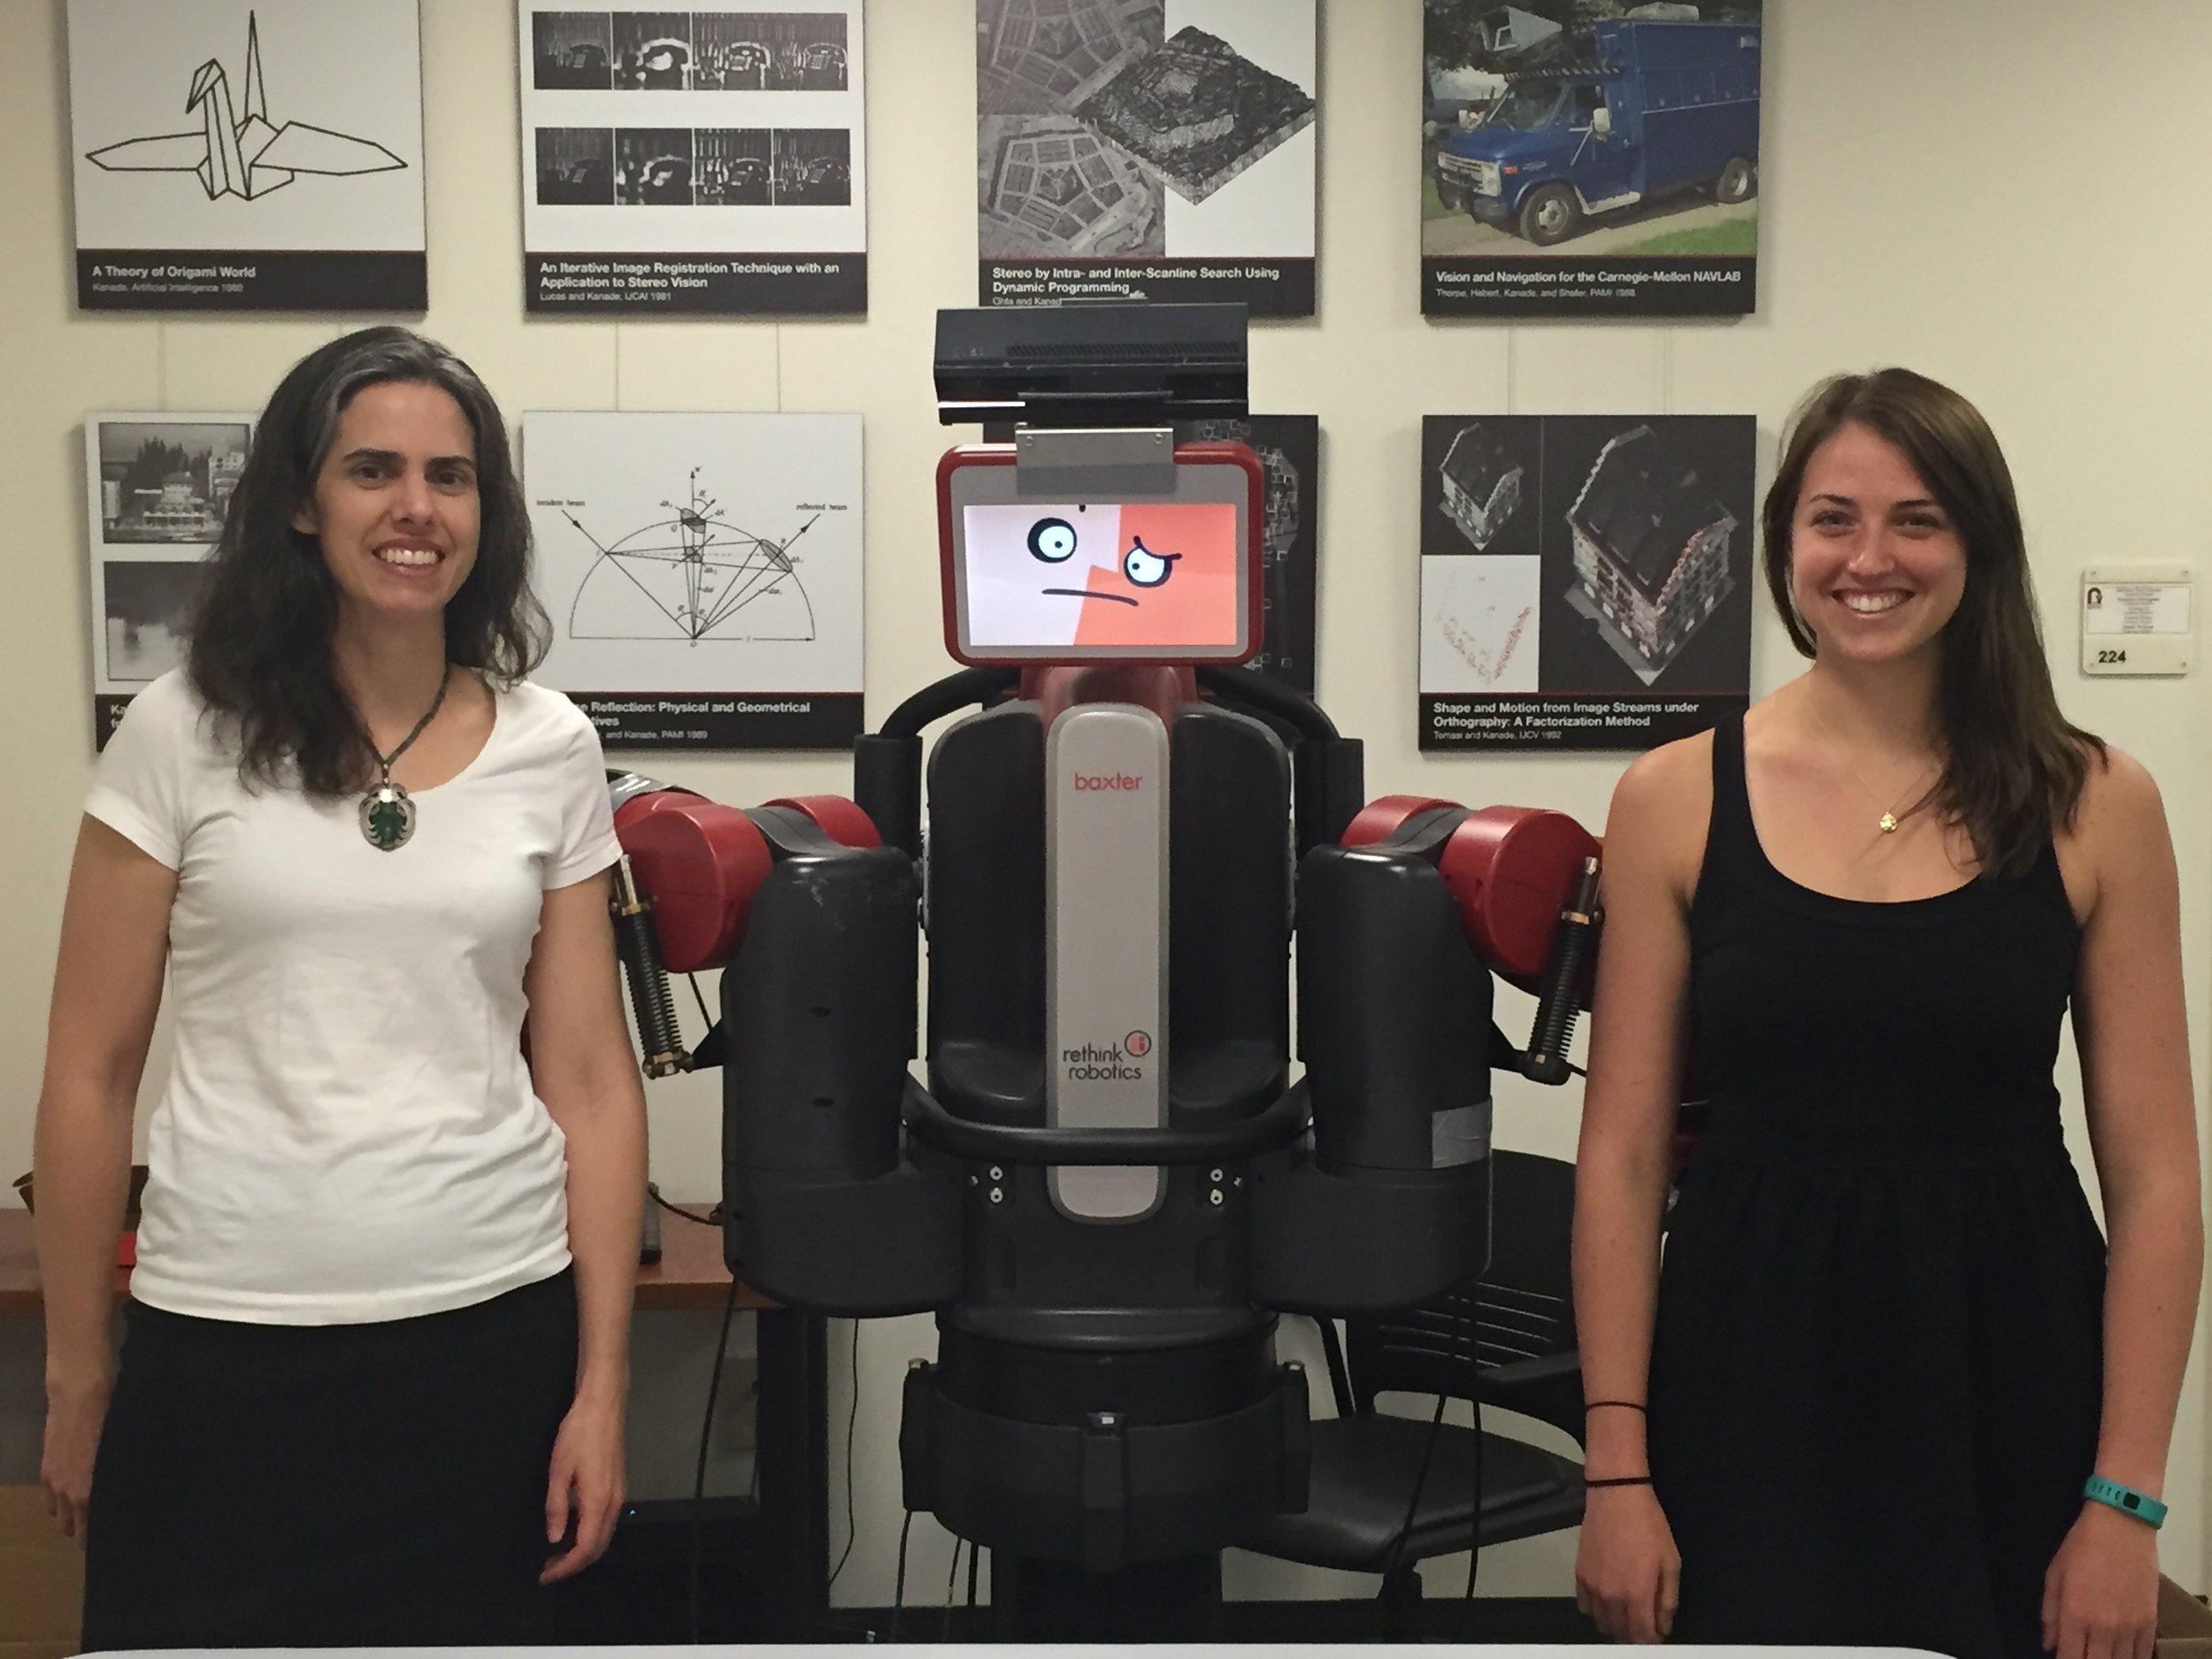 Suzanne Wynne - Grant Writer for Team RobotiX Erin Cawley - Instructional Technology Teacher